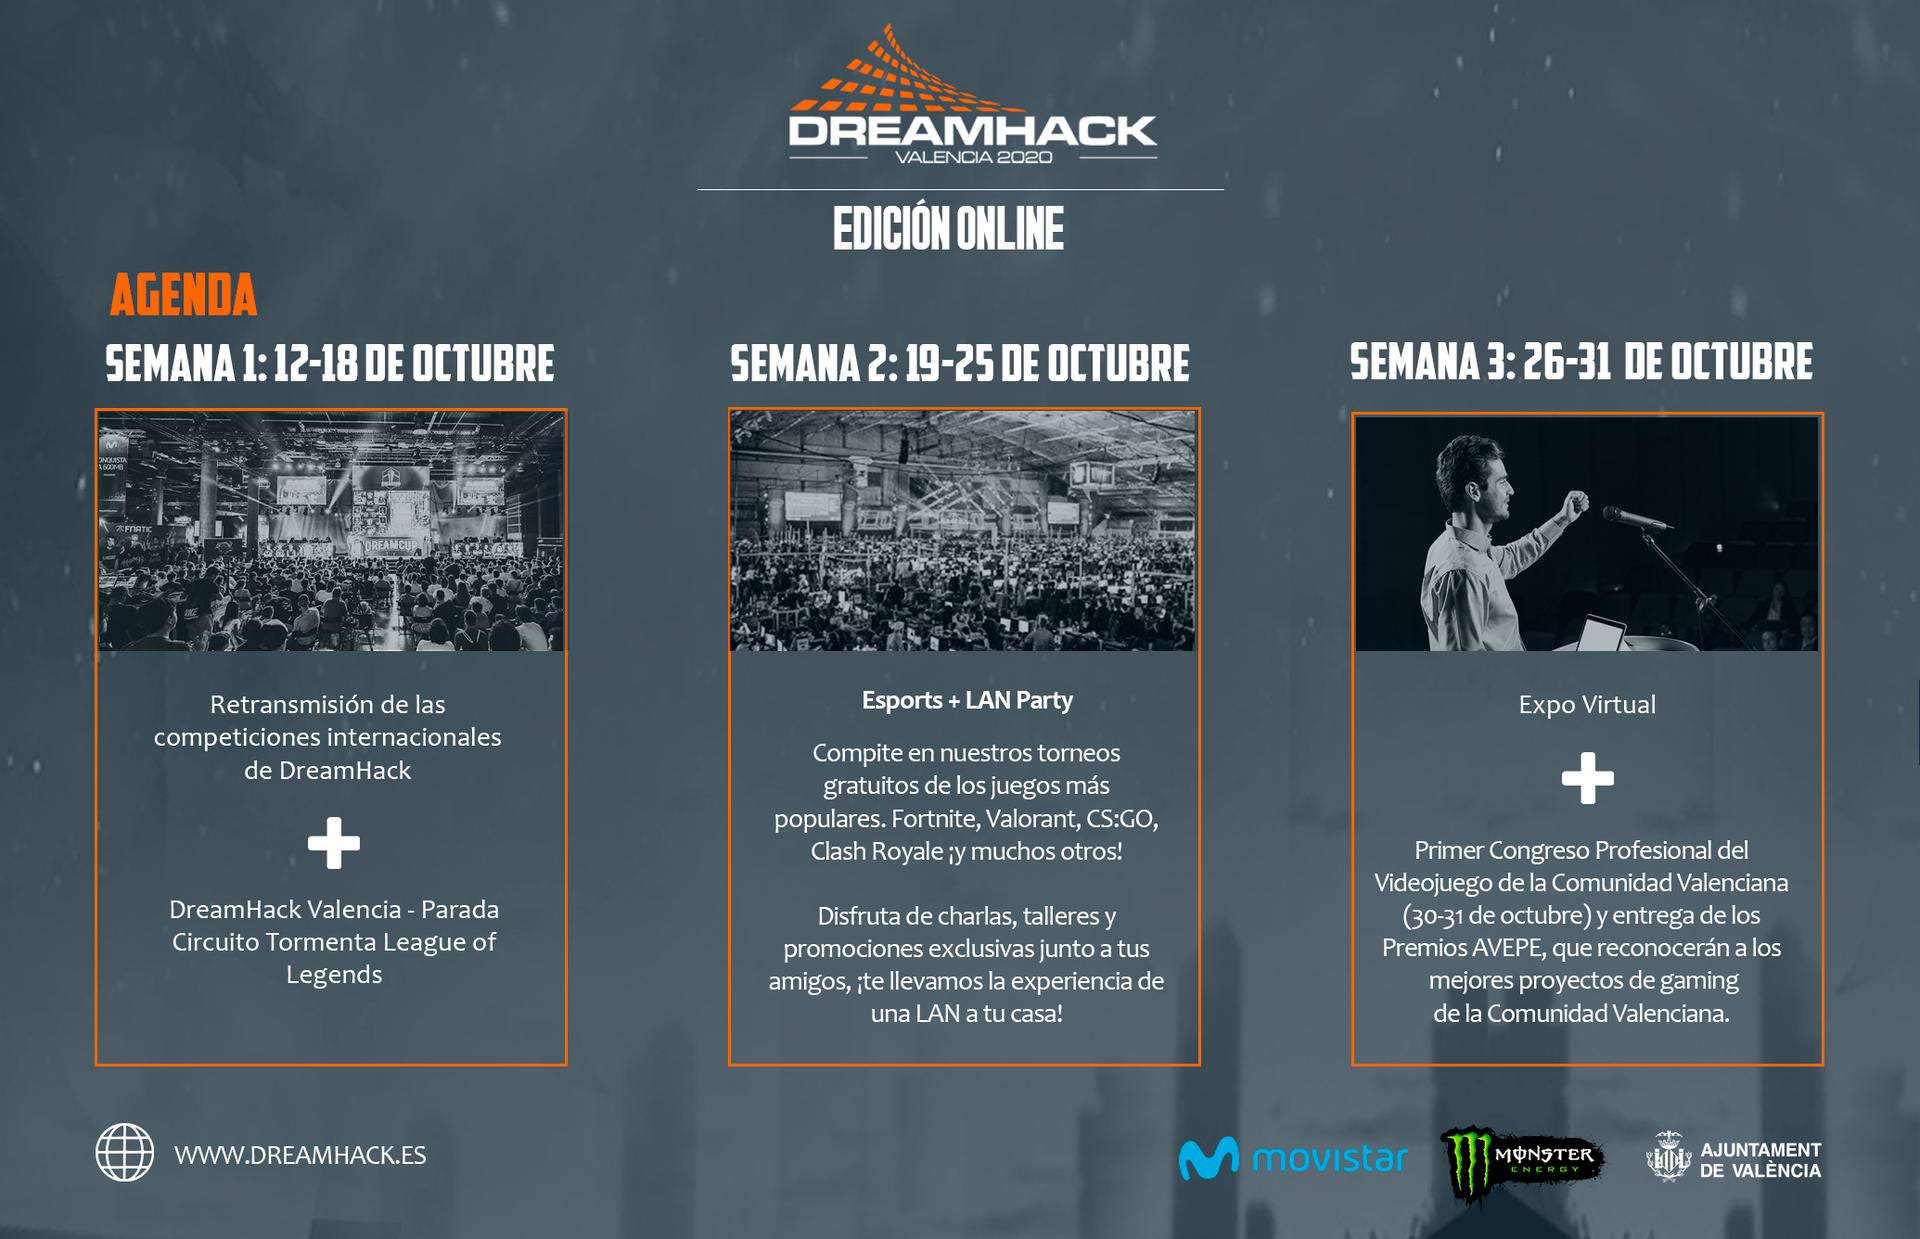 DreamHack Valencia Online 2020 información por semanas